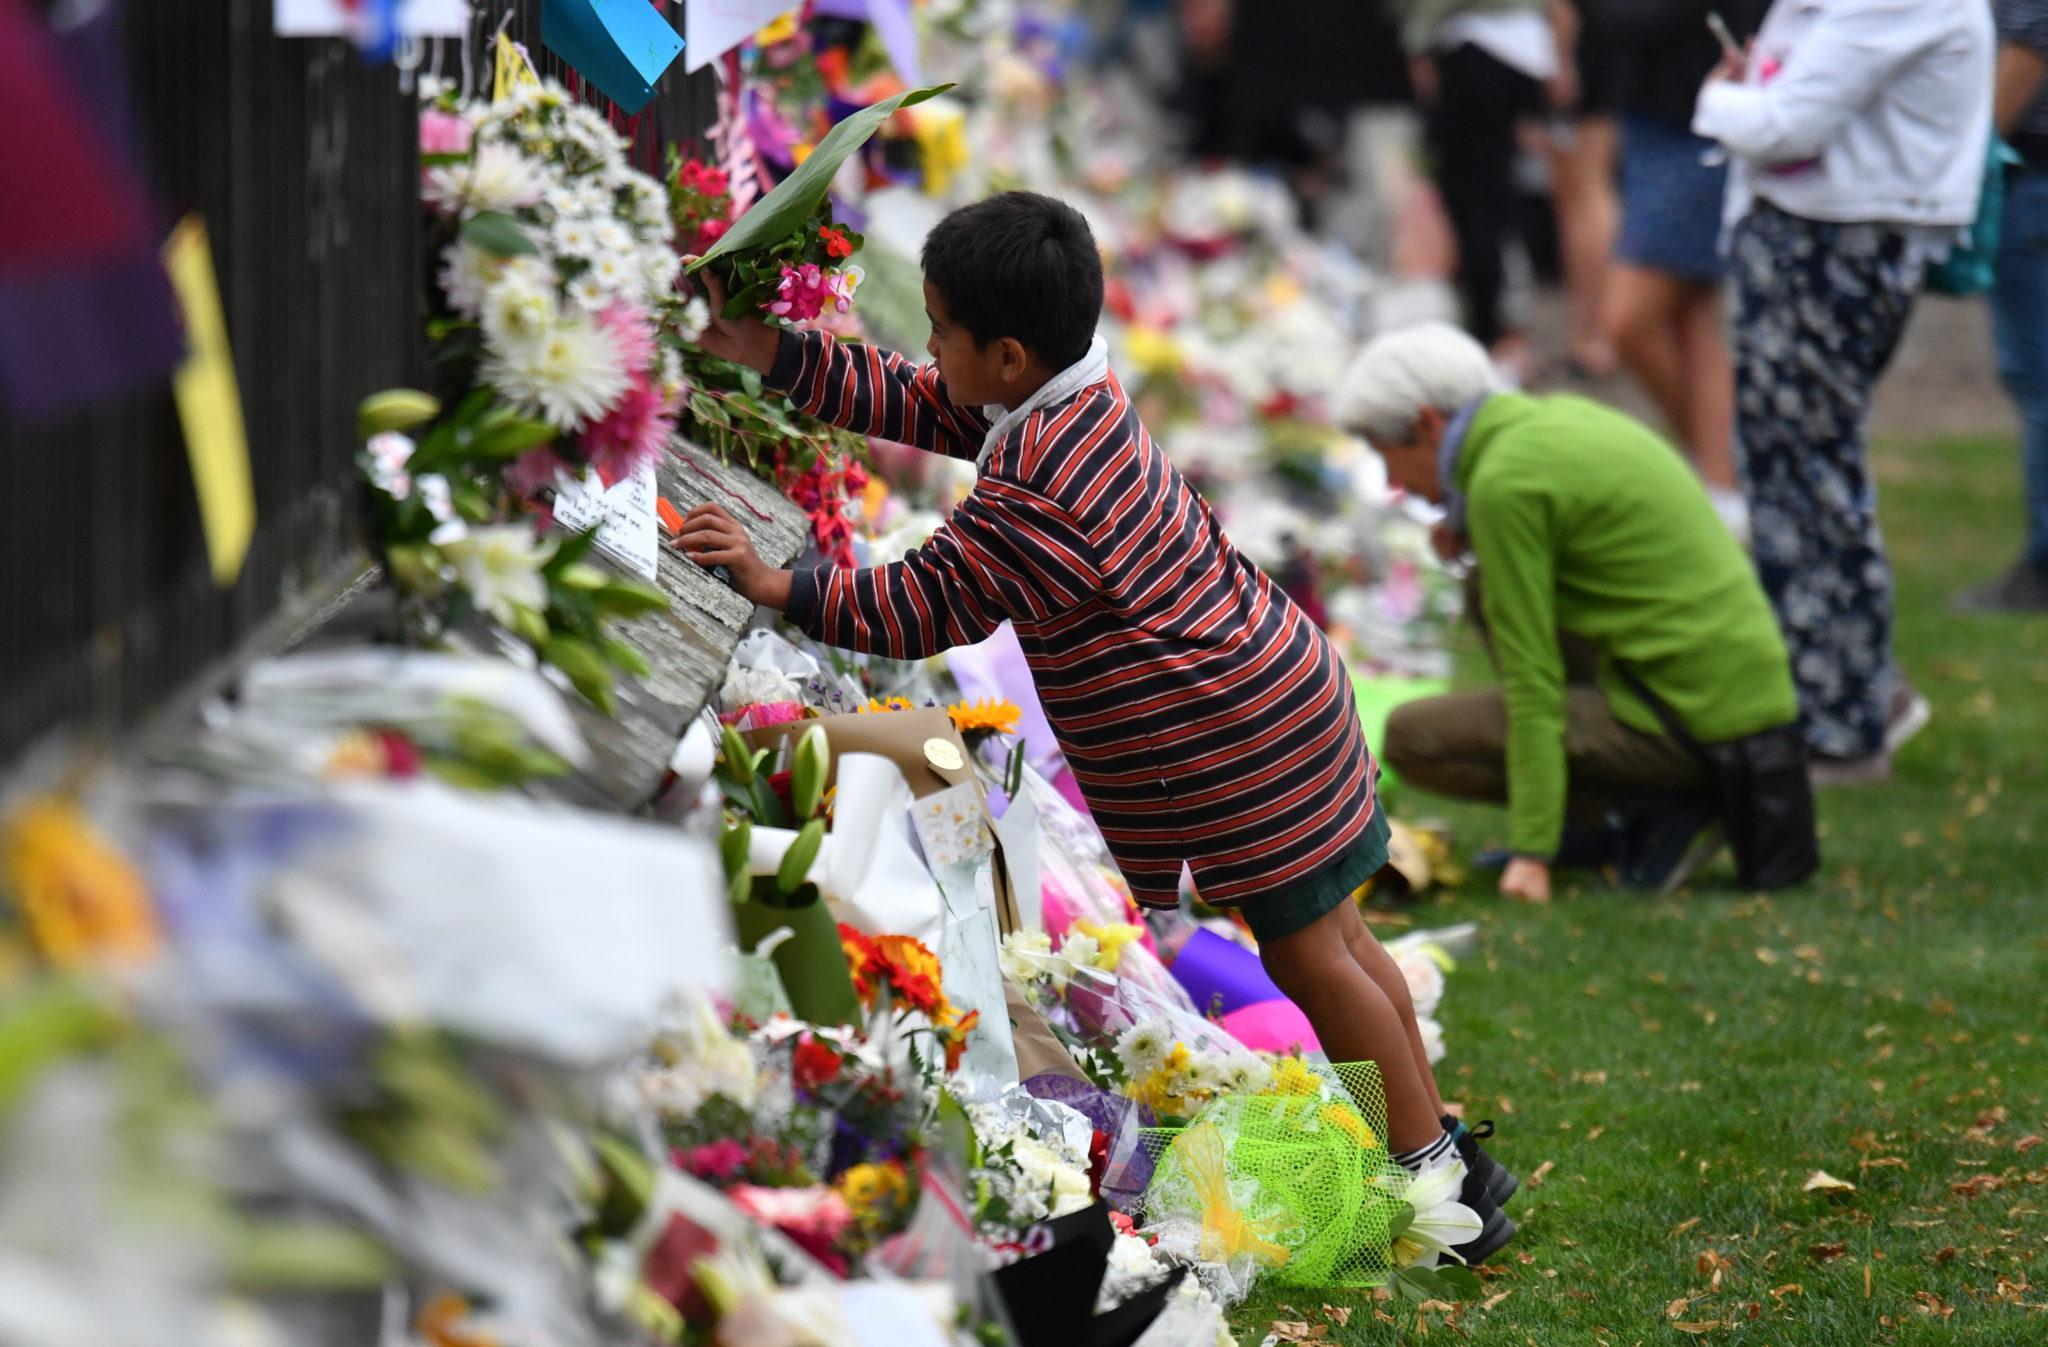 Nowa Zelandia, mieszkańcy Christchurch, fot. MICK TSIKAS, PAP/EPA